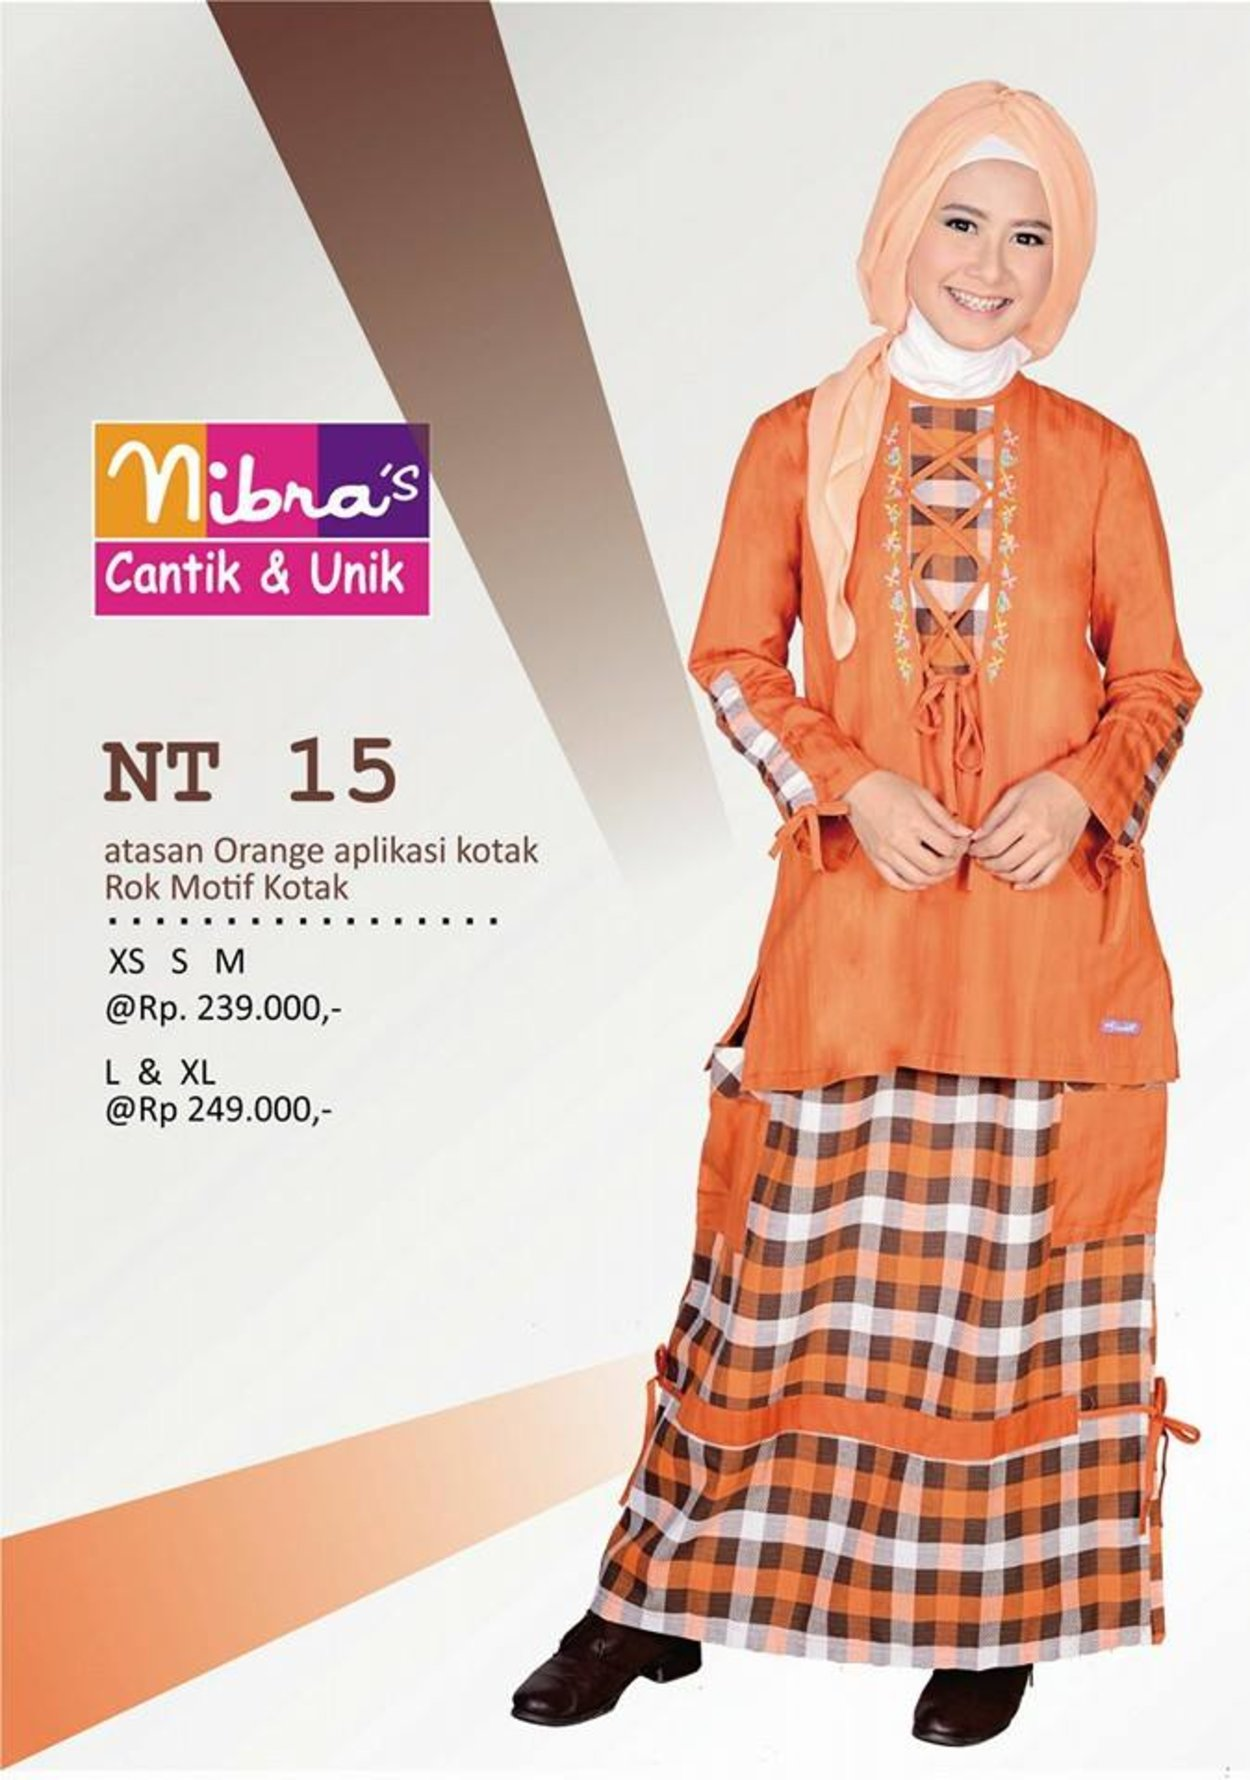 nt 15 orange